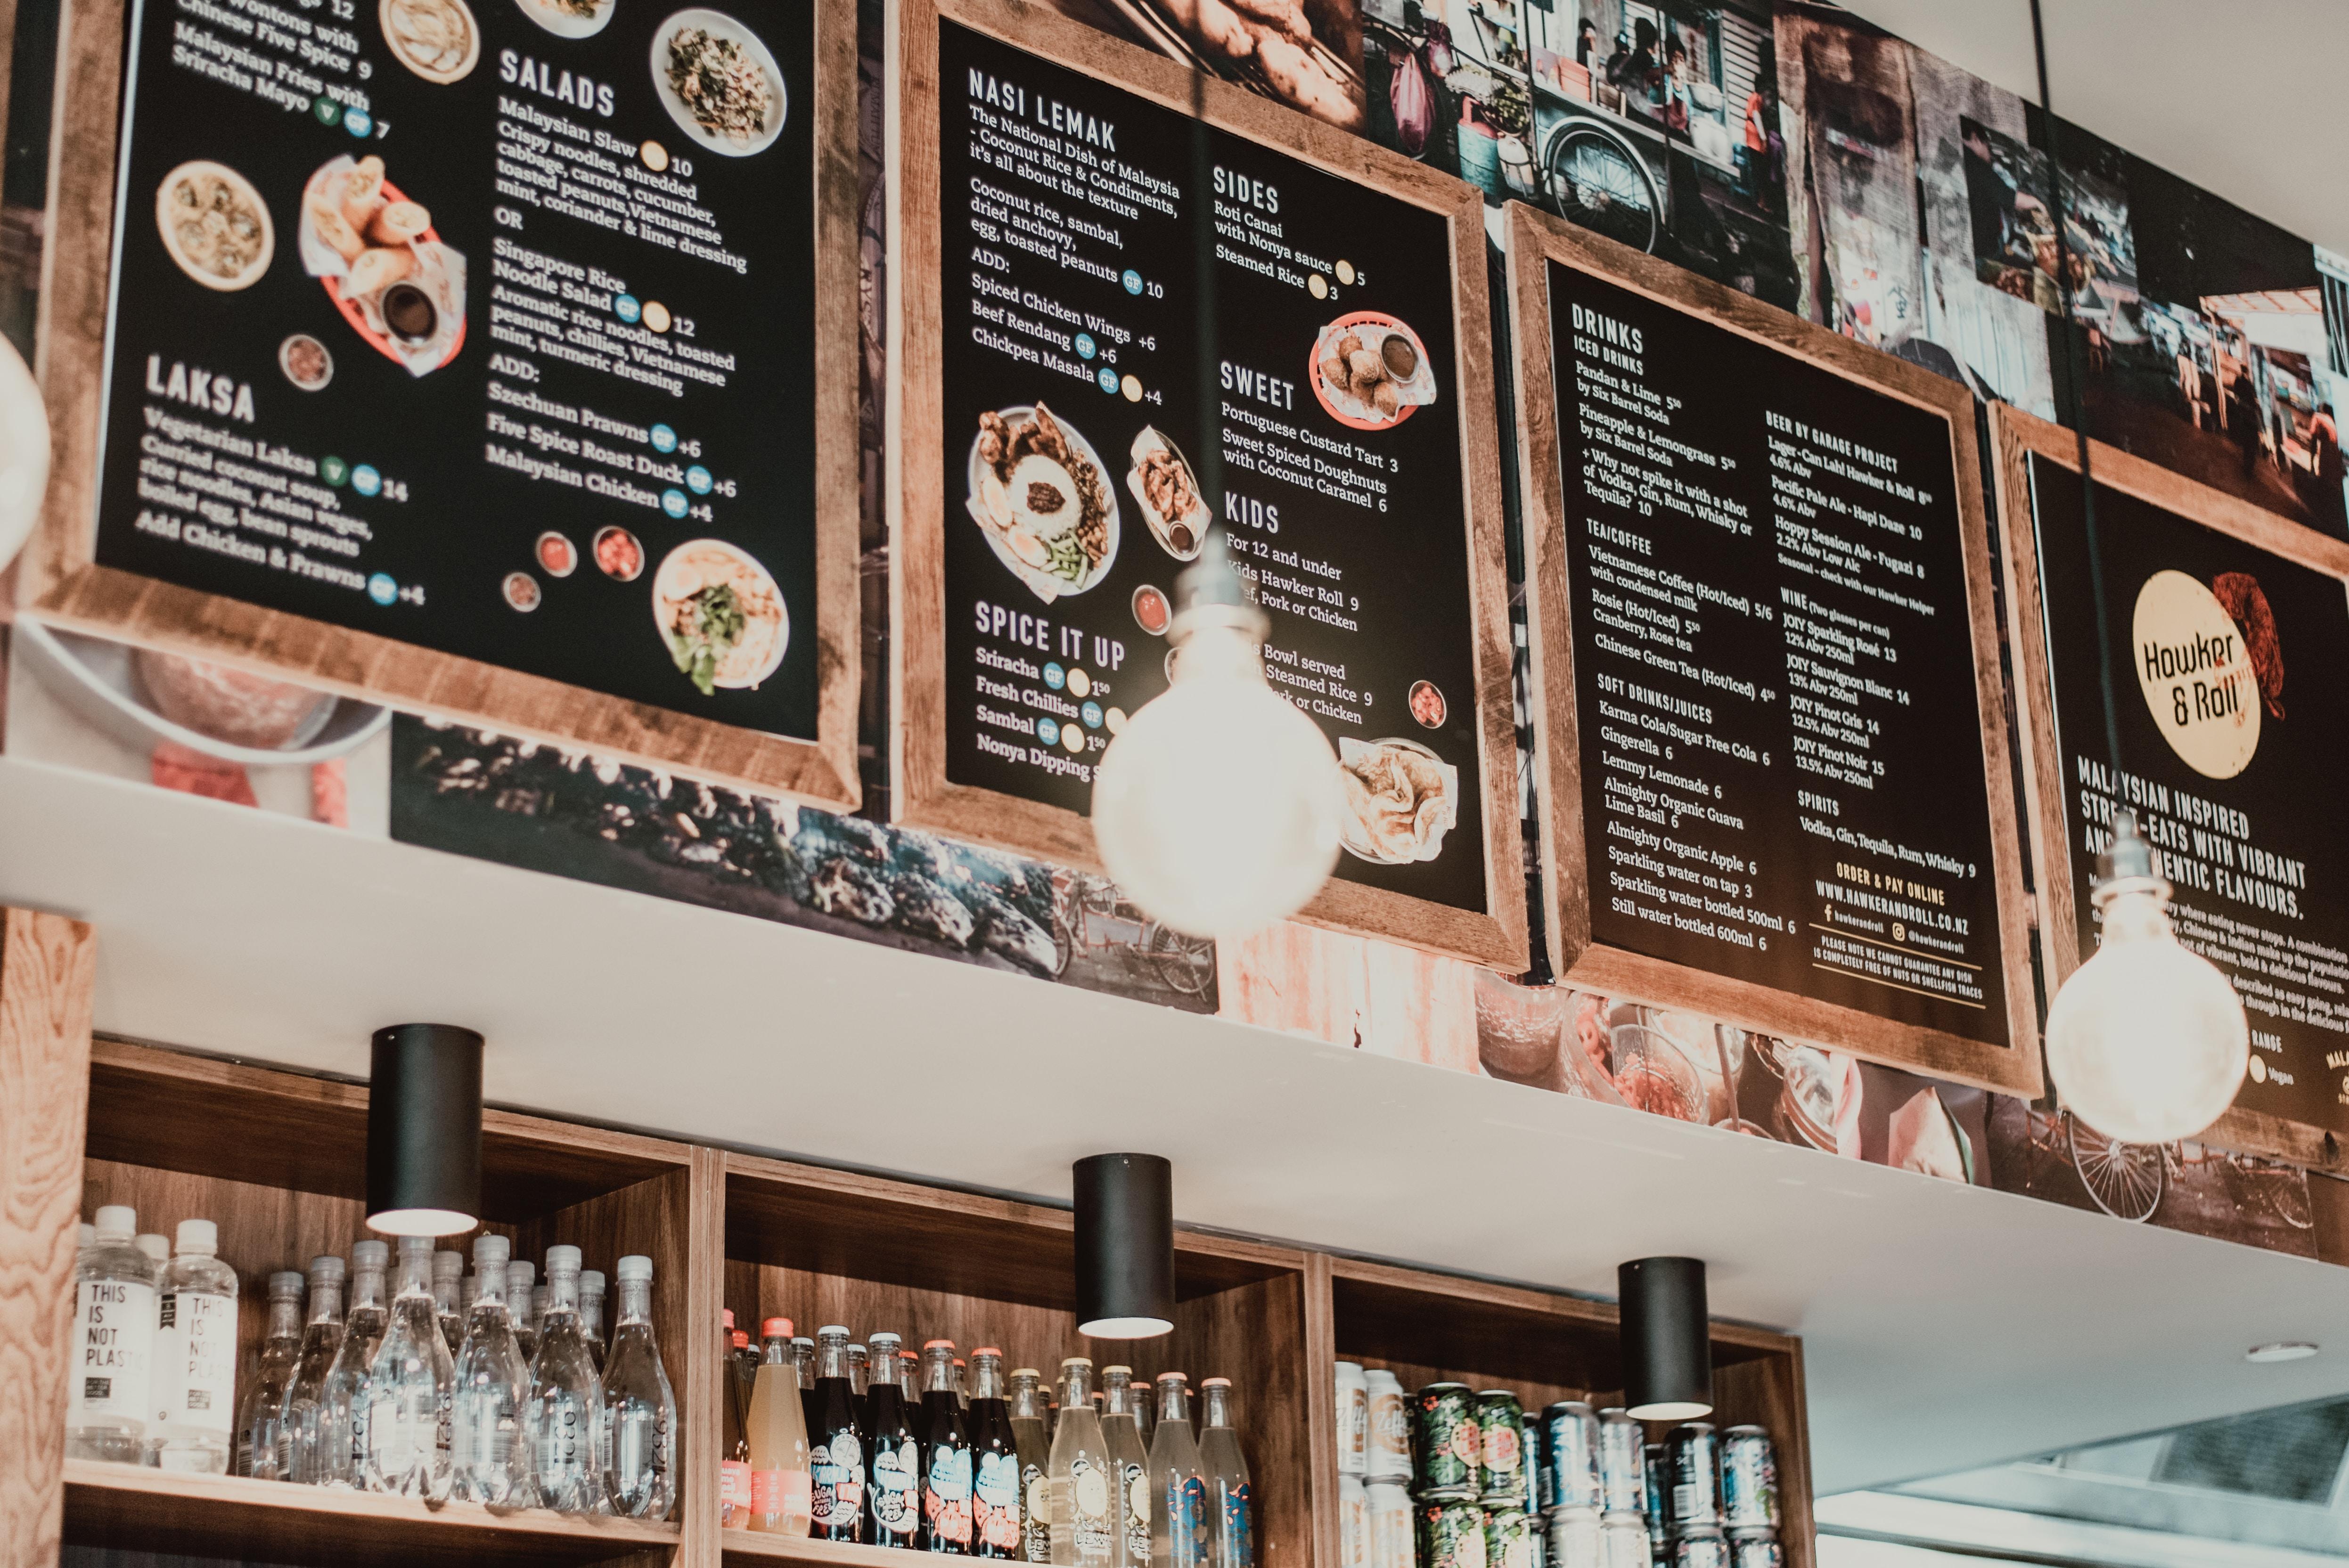 Open Your Own Restaurant